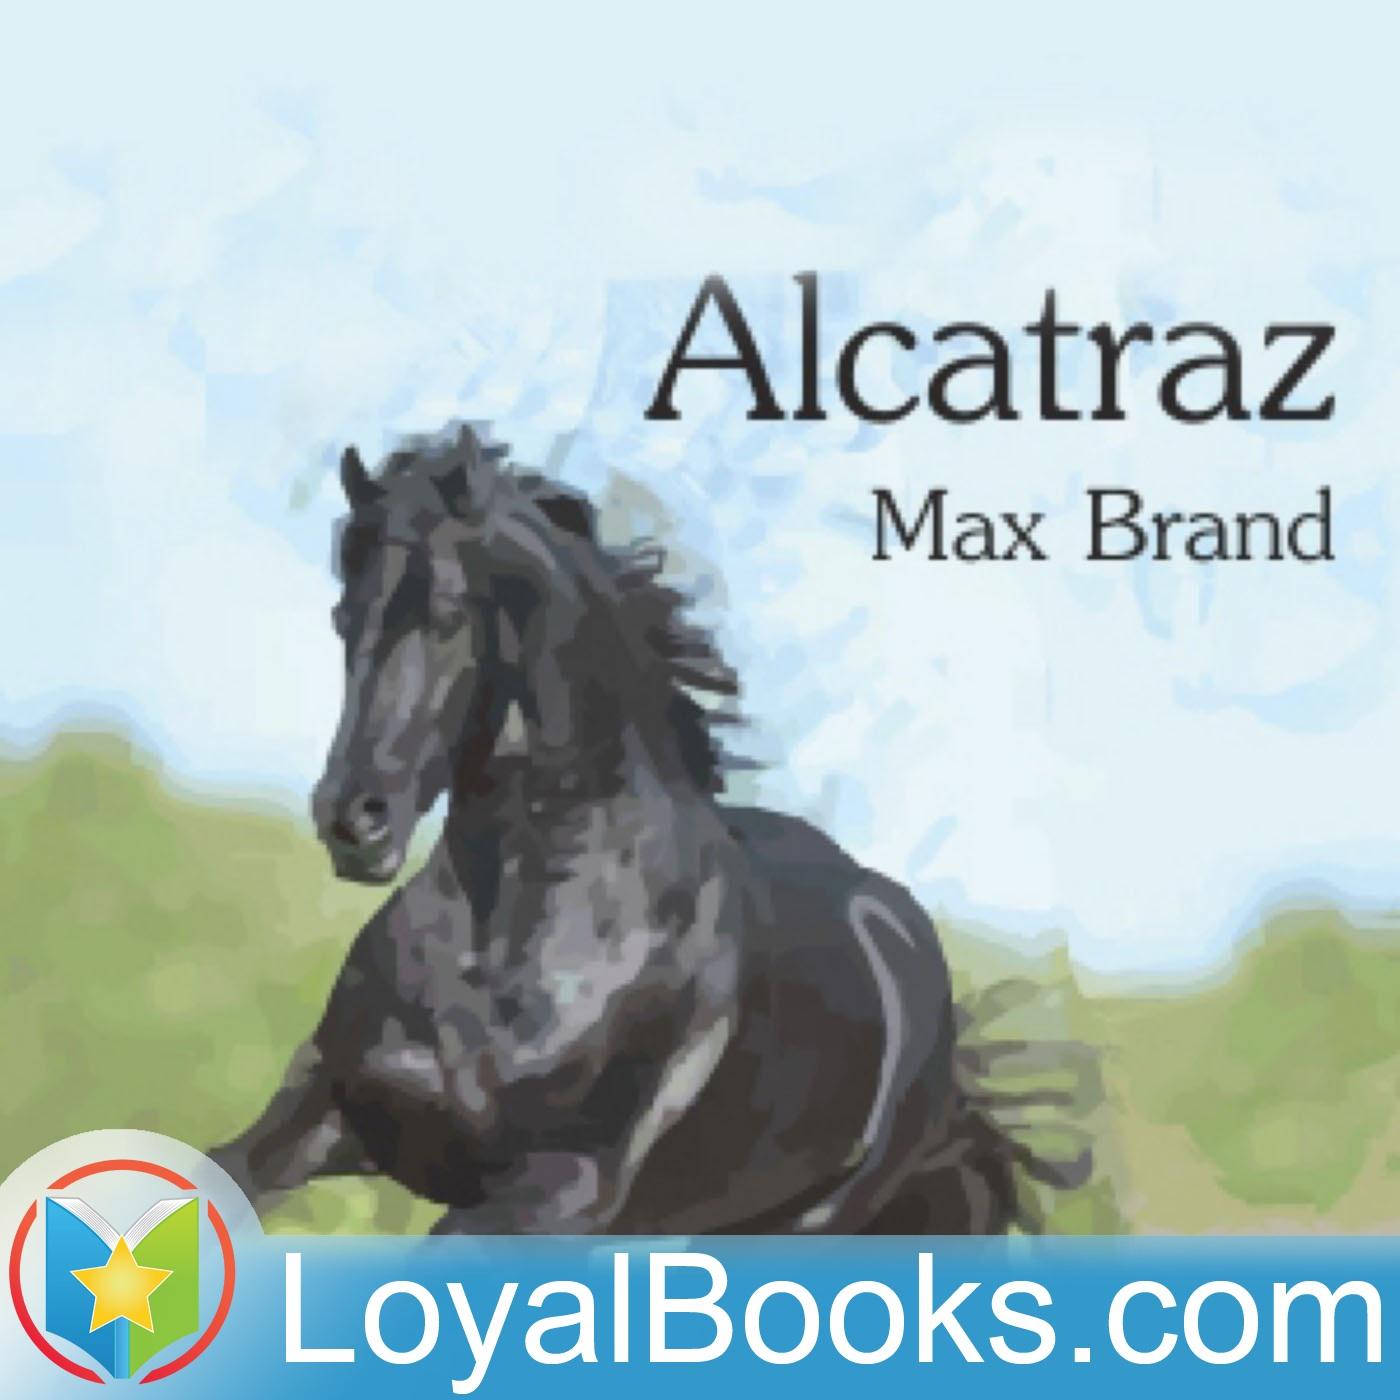 <![CDATA[Alcatraz by Max Brand]]>